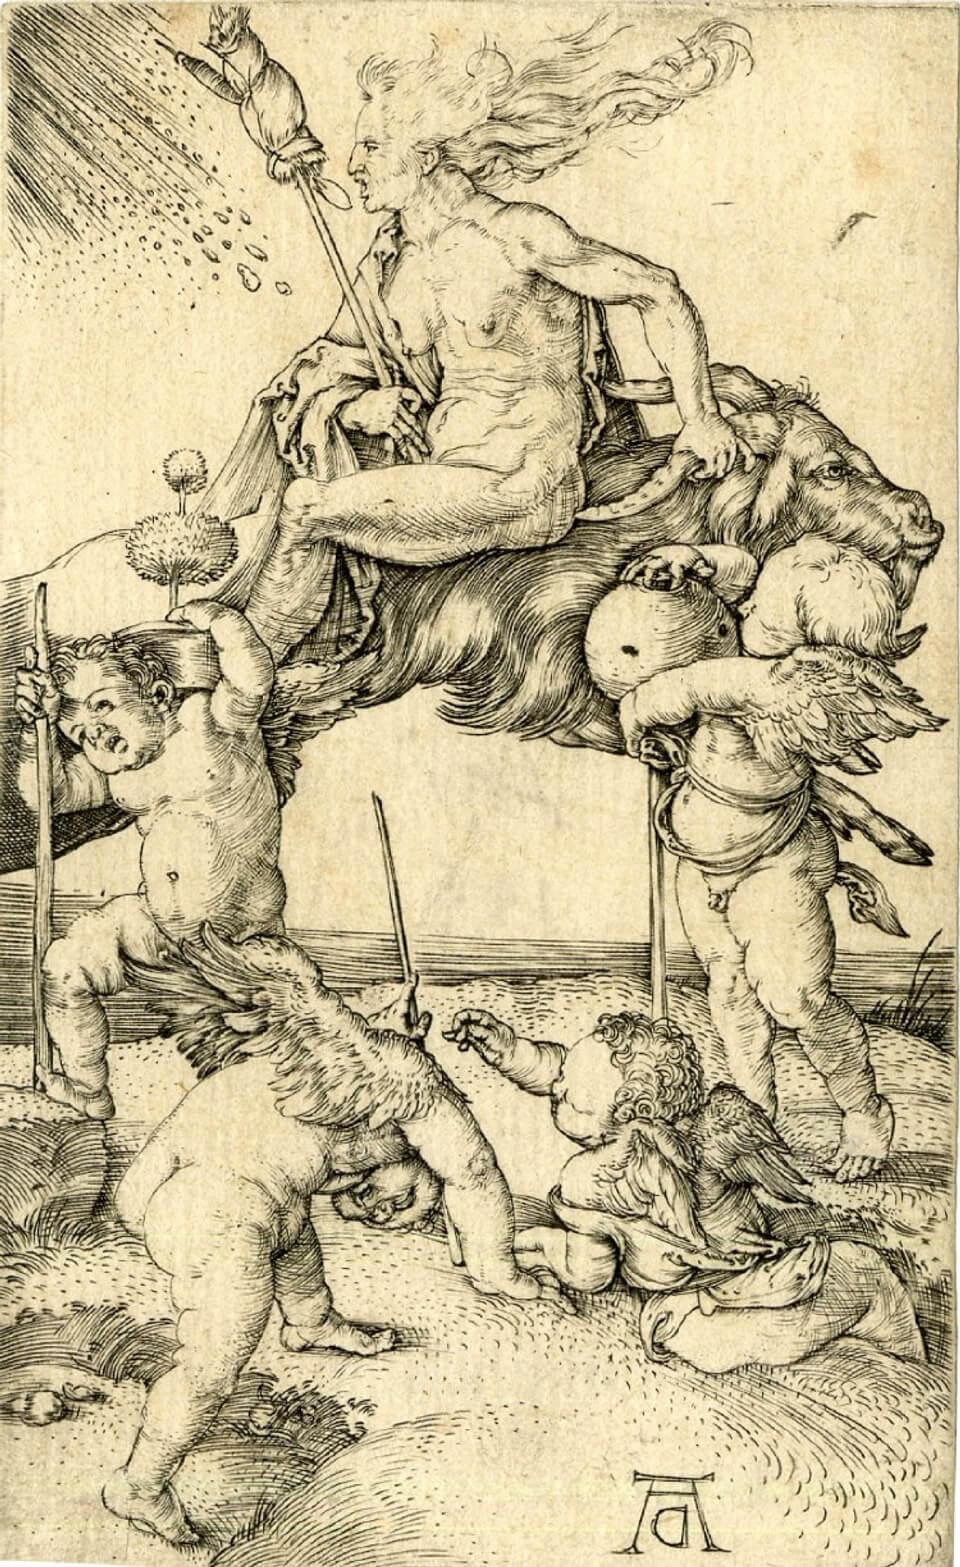 Apócrifa Art Magazine, Brujas, Bruja montando una cabra al revés